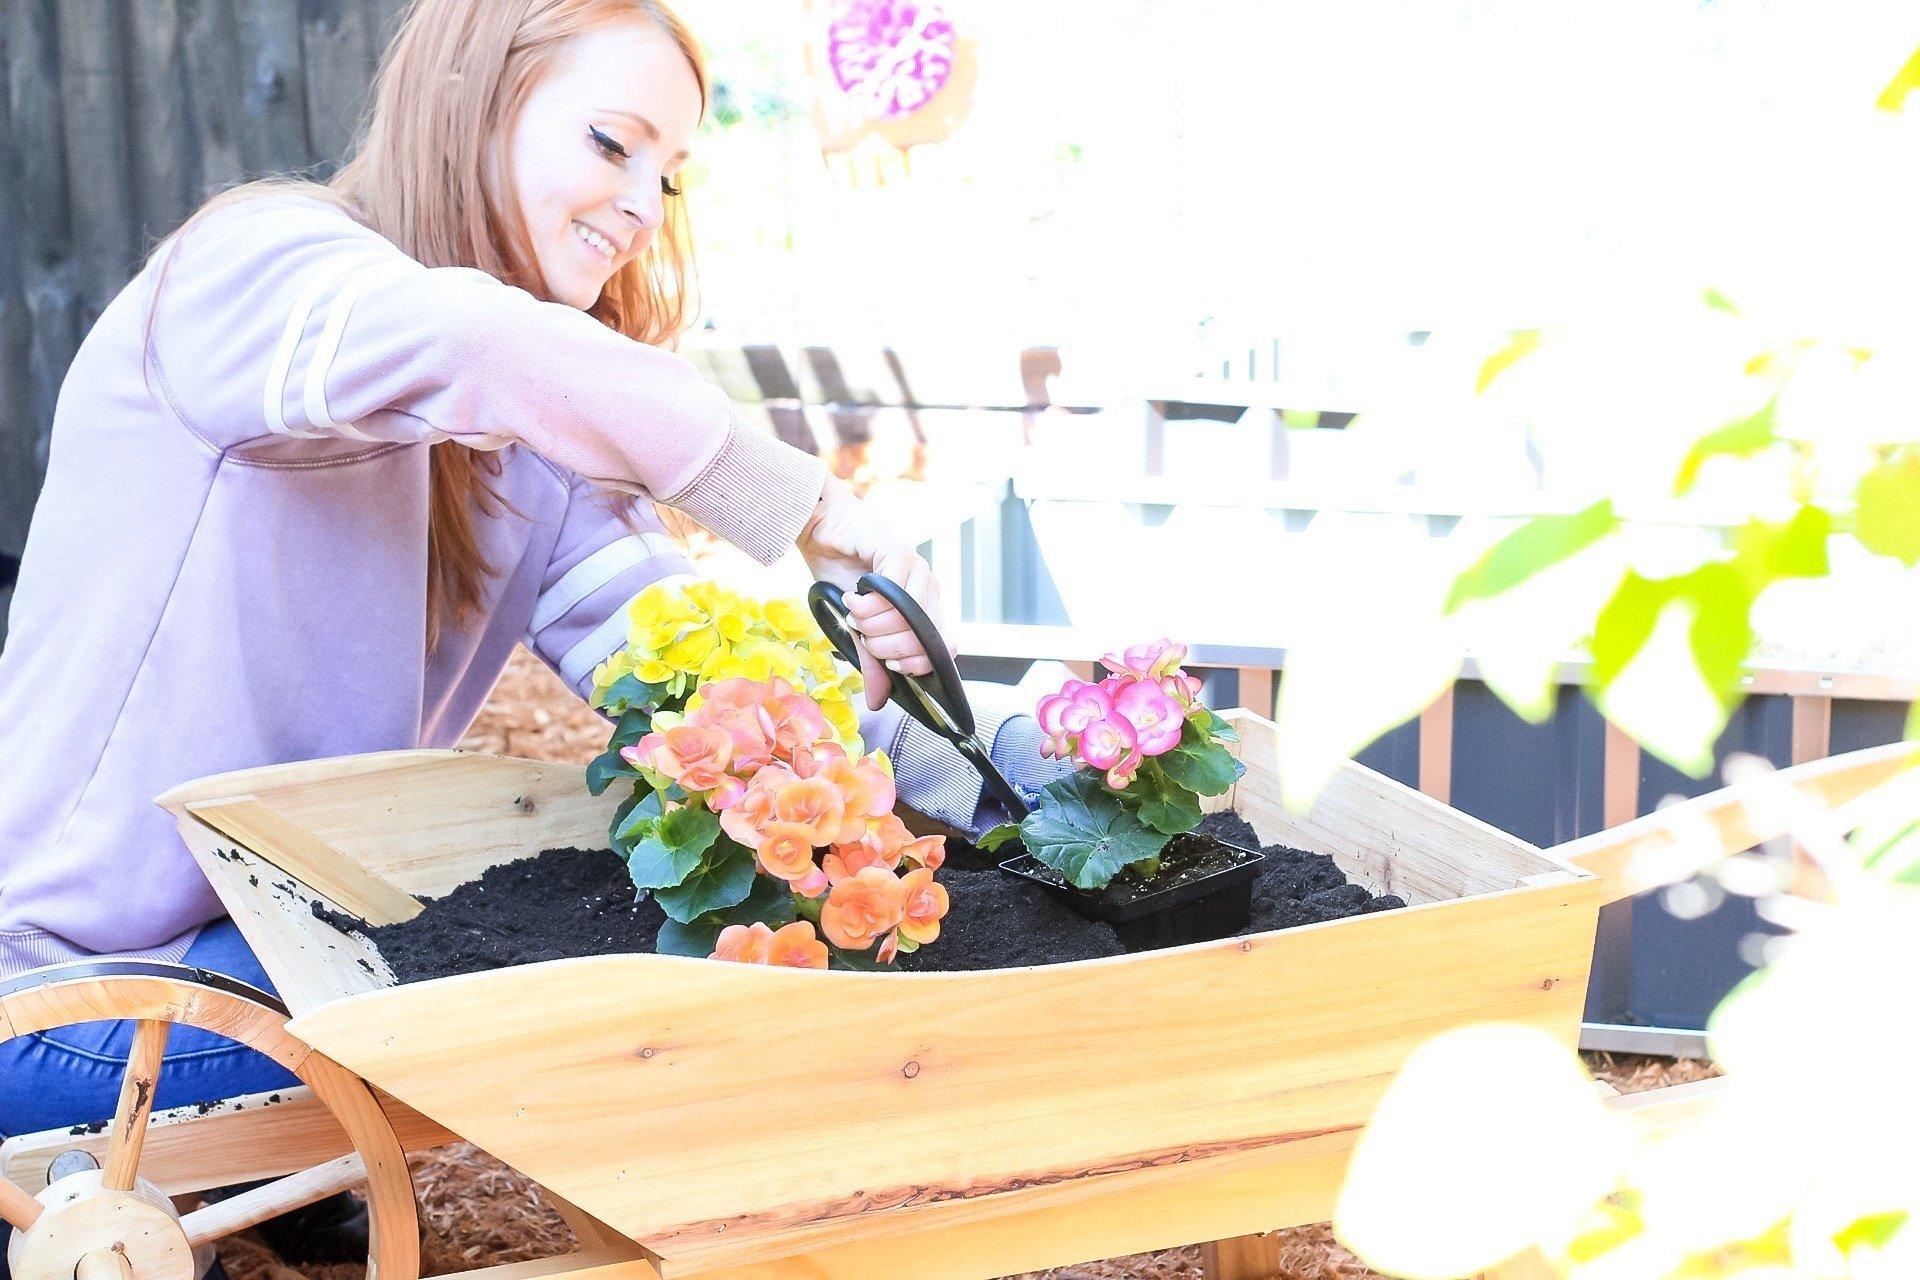 gardening tips - flling up the wheelbarrow